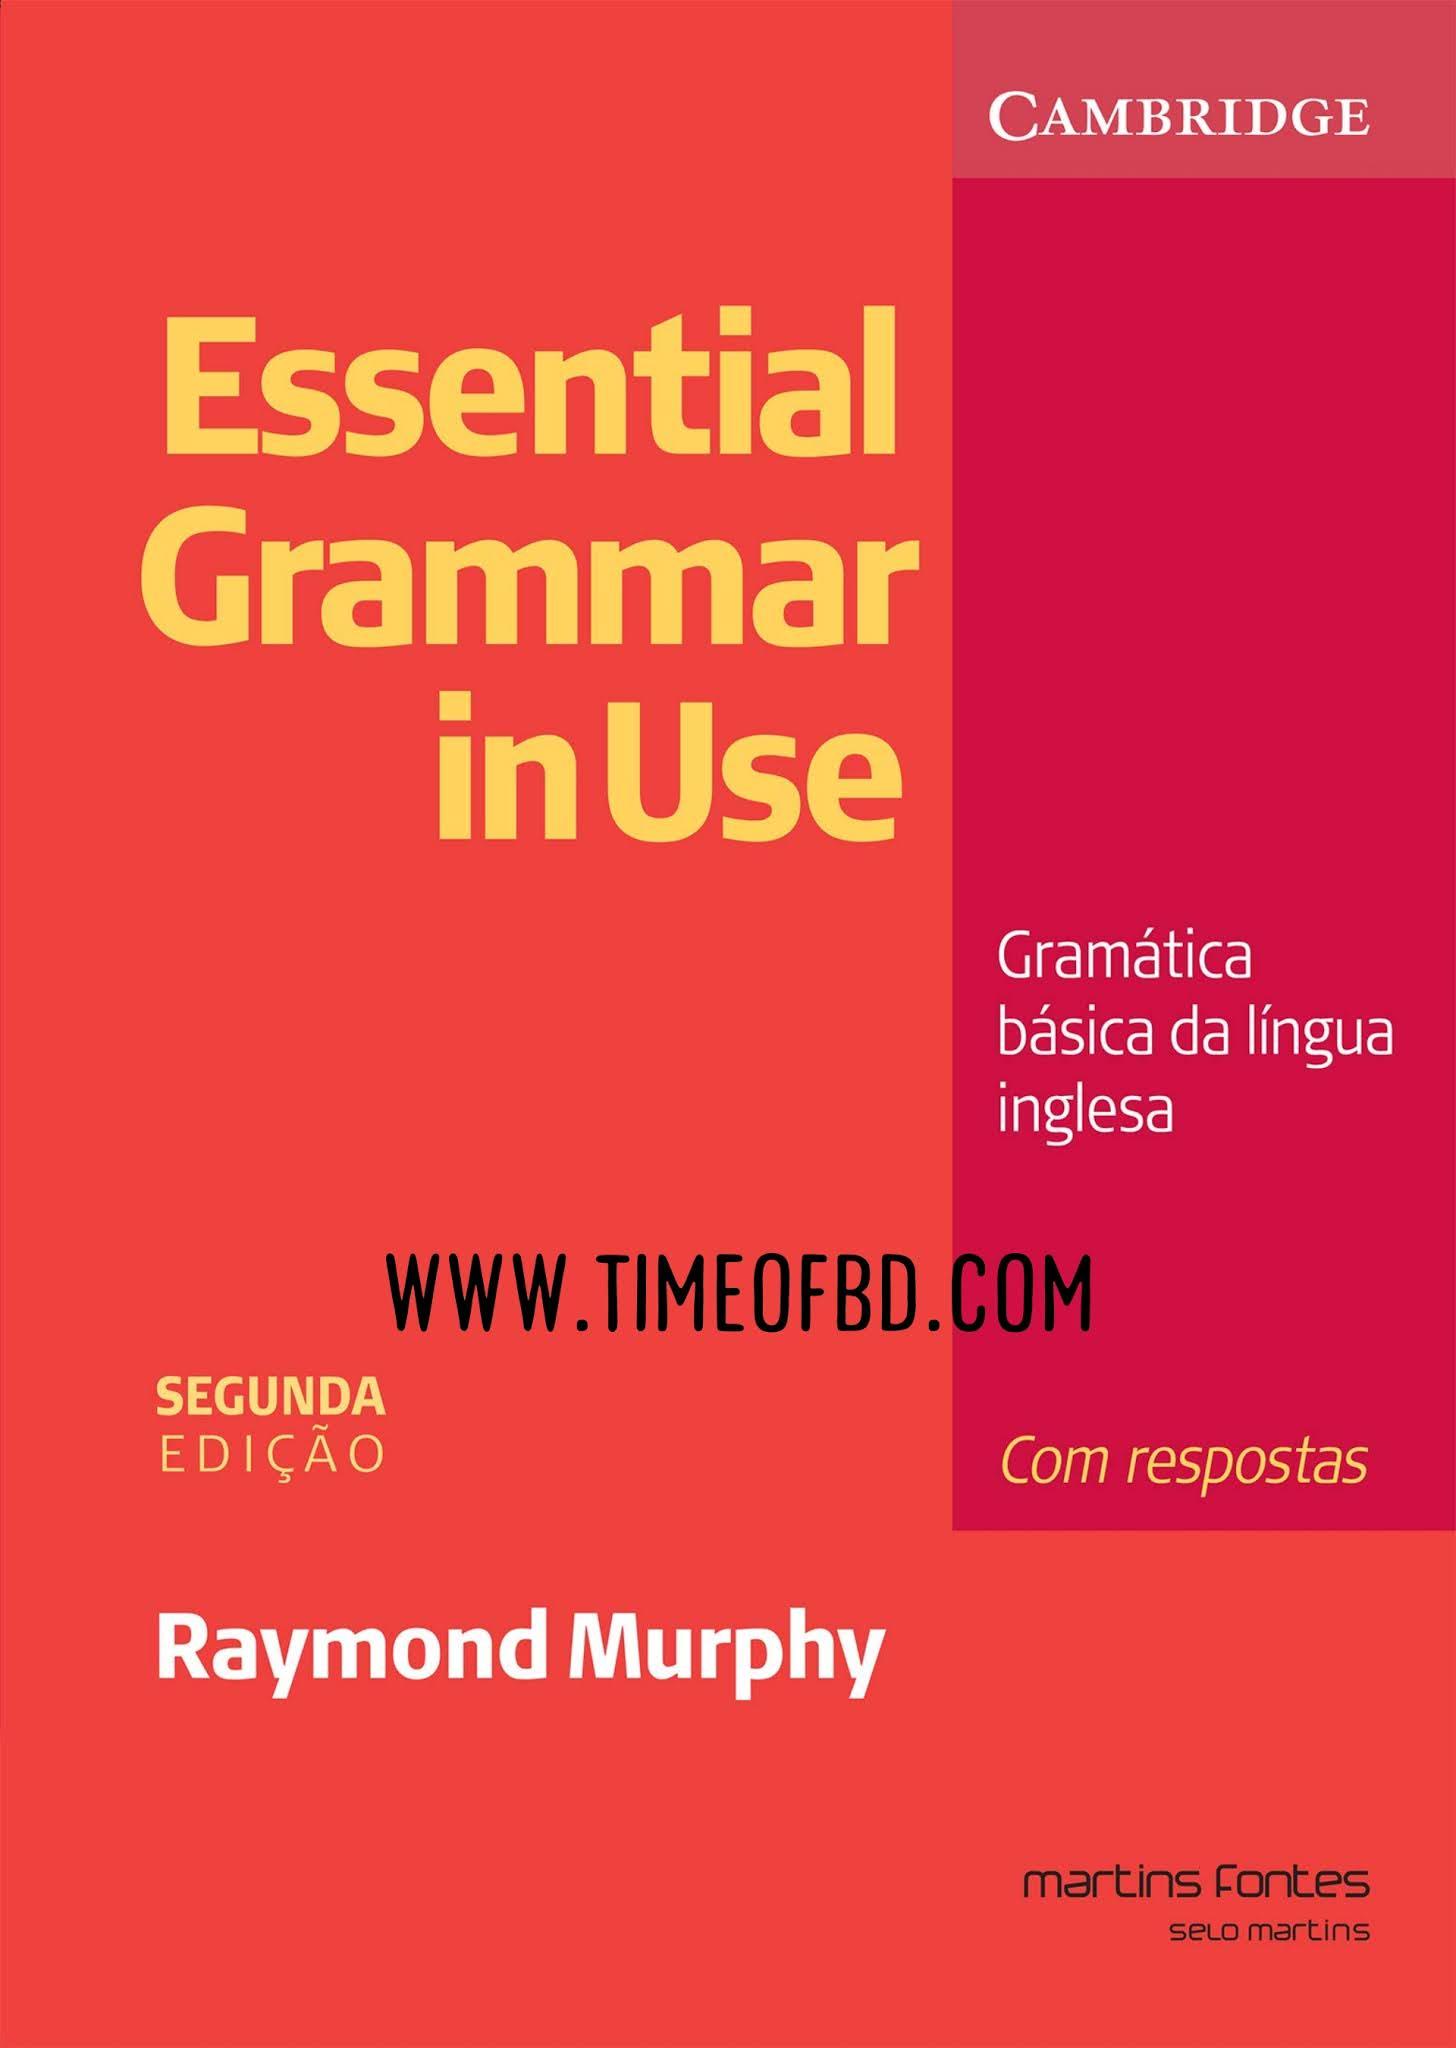 Essential grammer in use,Essential grammer in use pdf file, Essential grammer in use pdf download, Essential grammer in use online